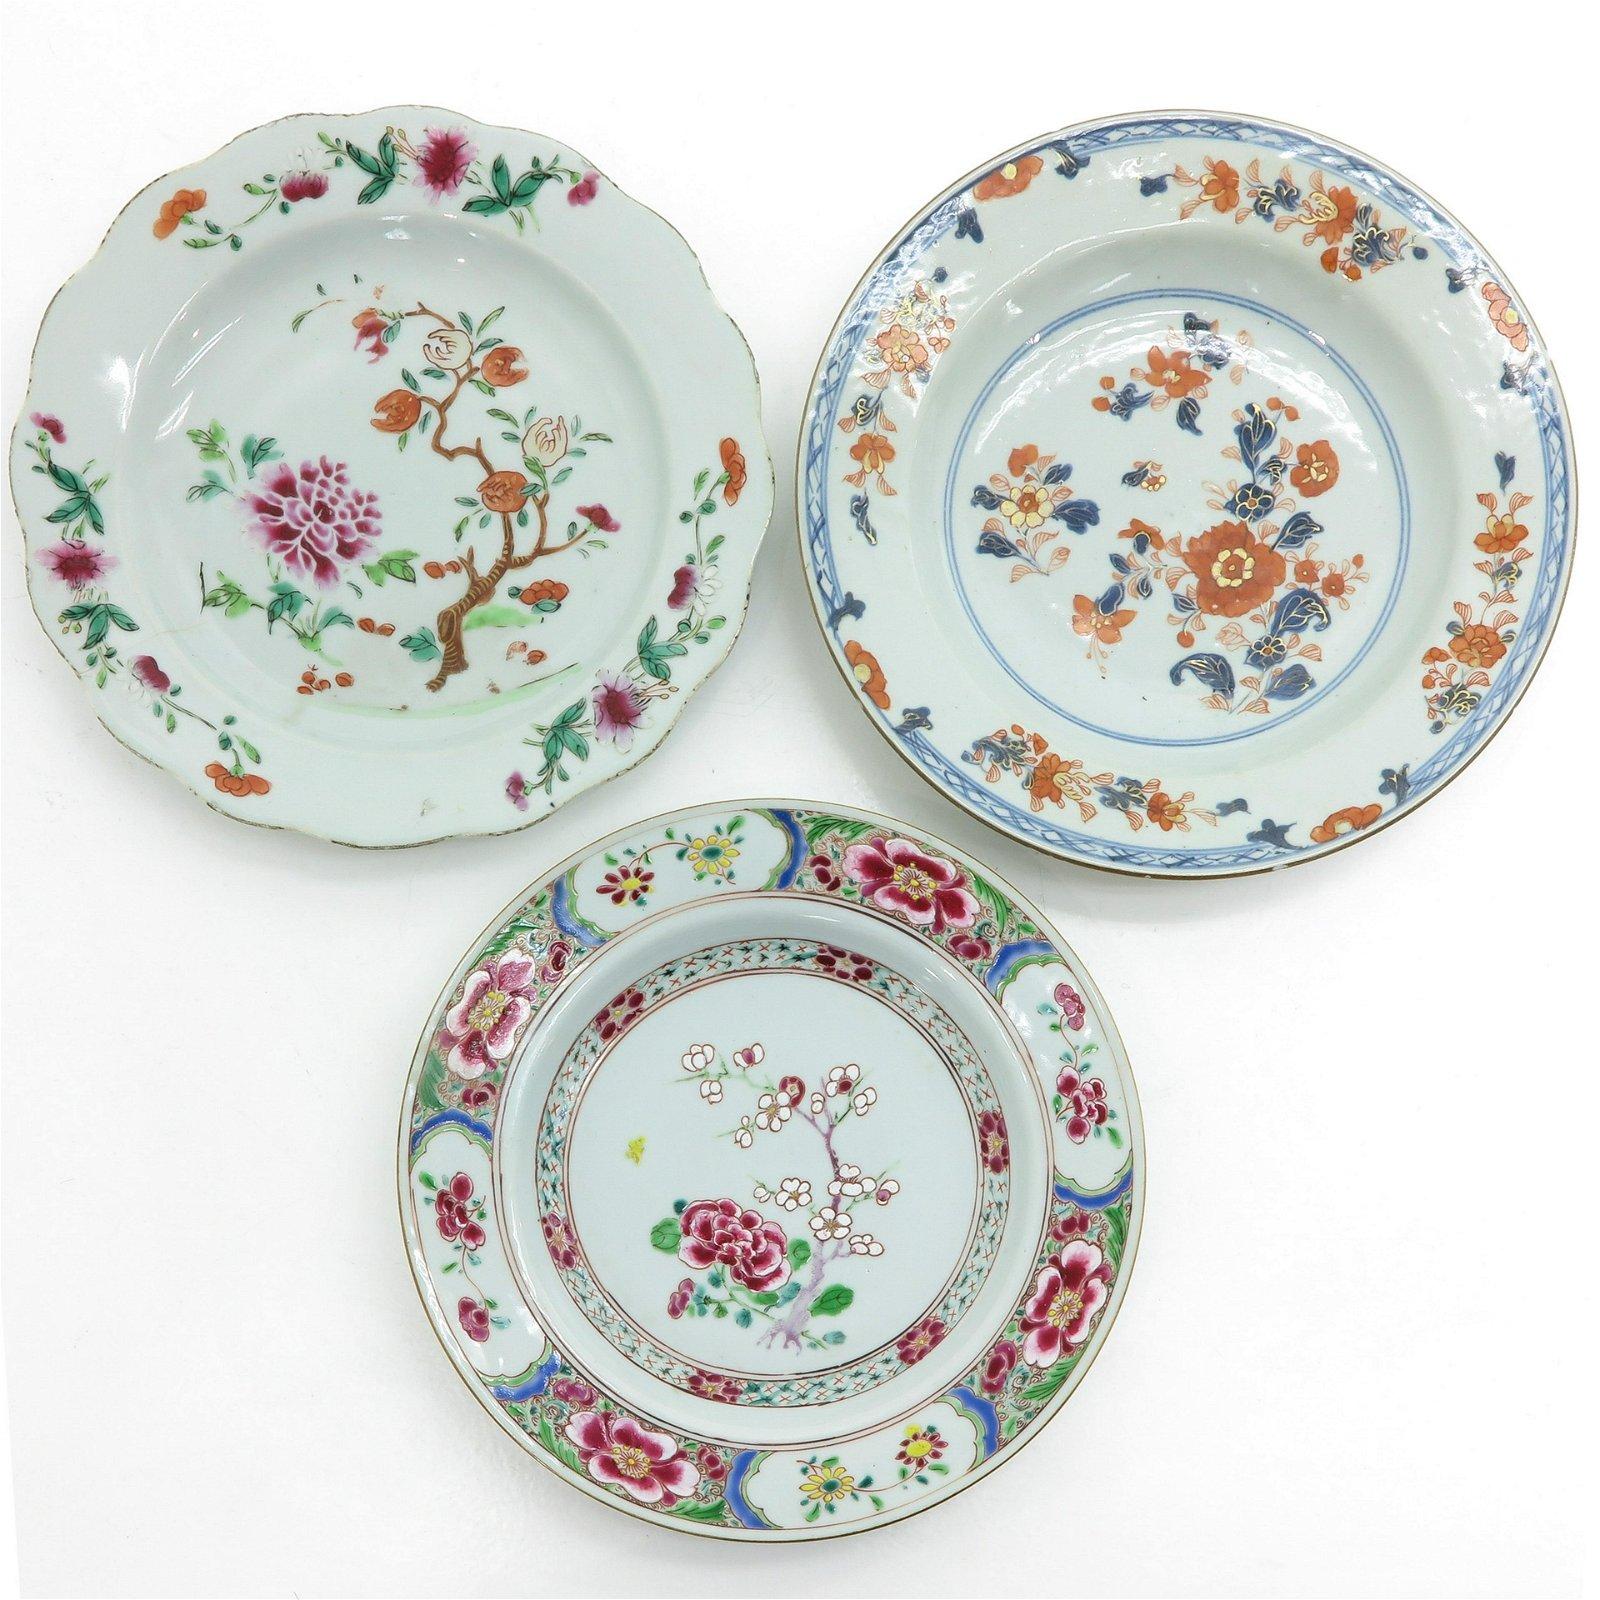 Three Polychrome Decor Plates